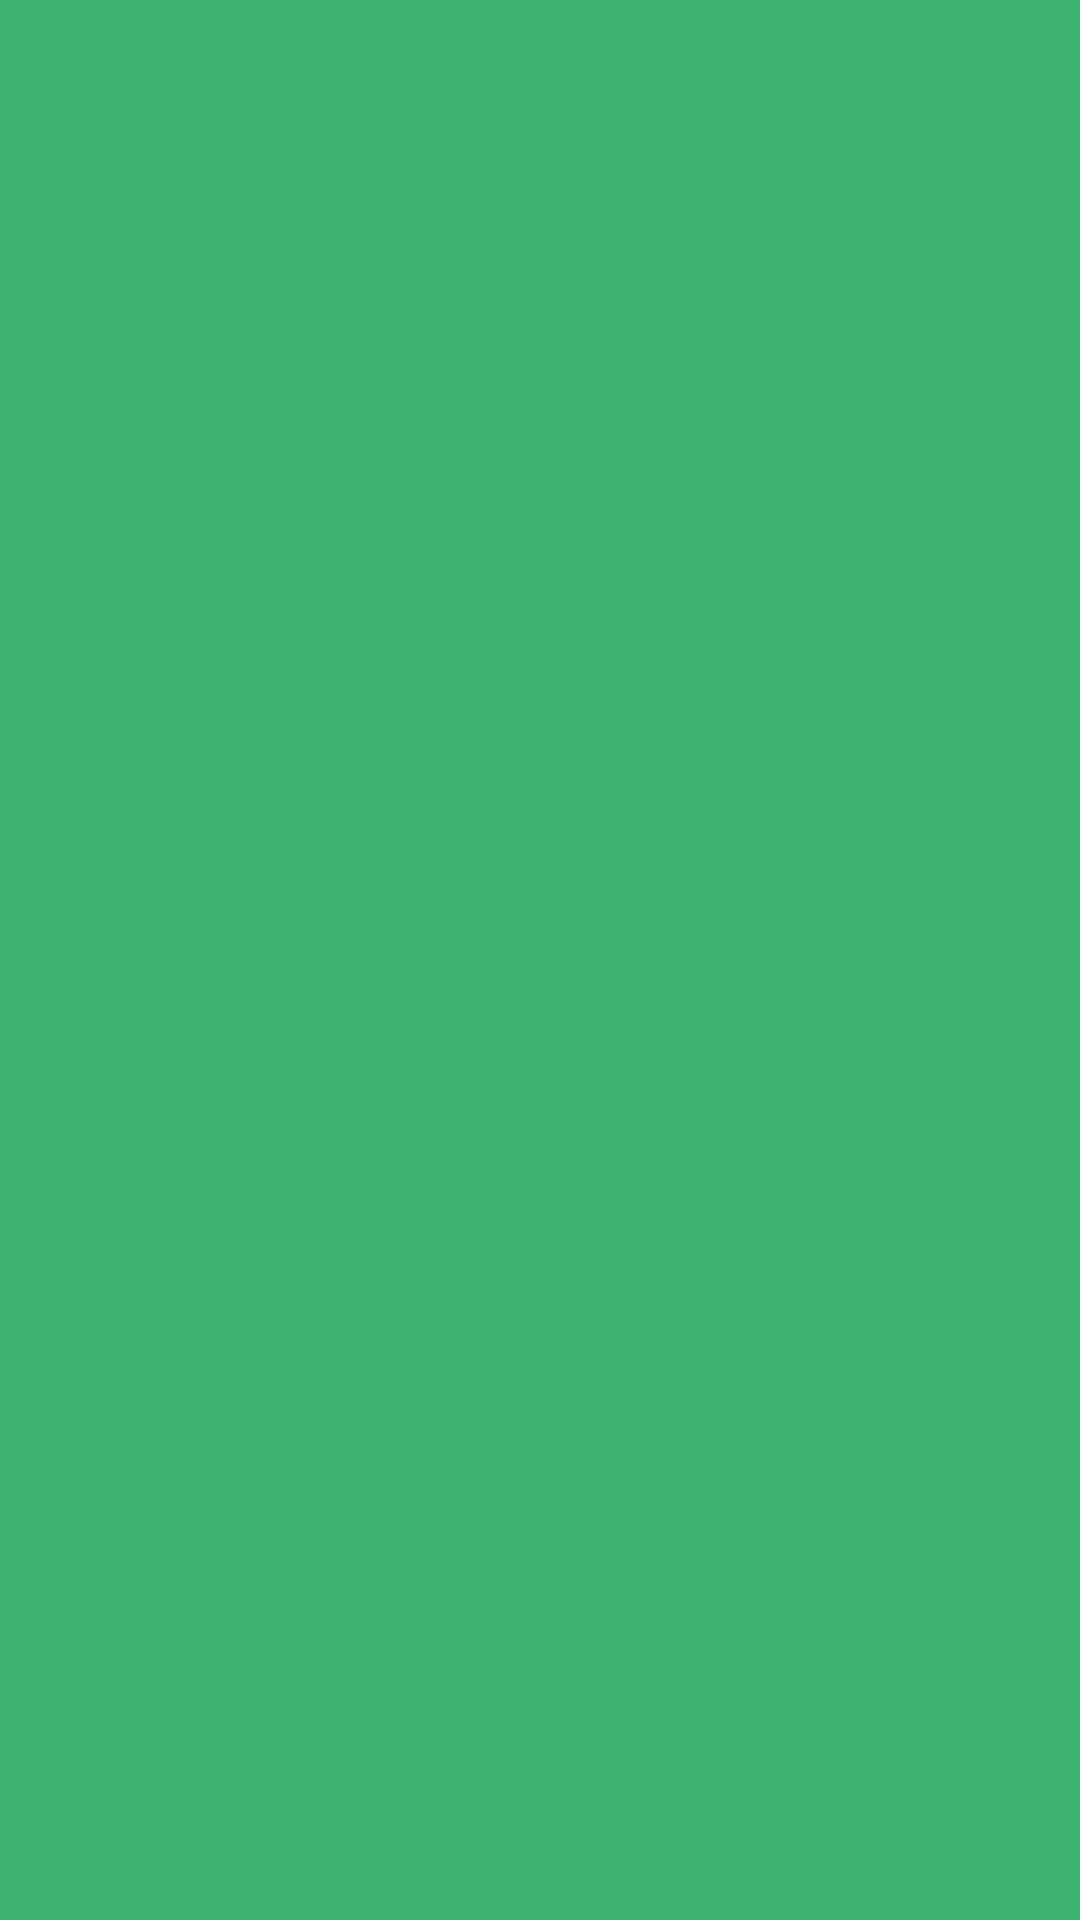 1080x1920 Medium Sea Green Solid Color Background